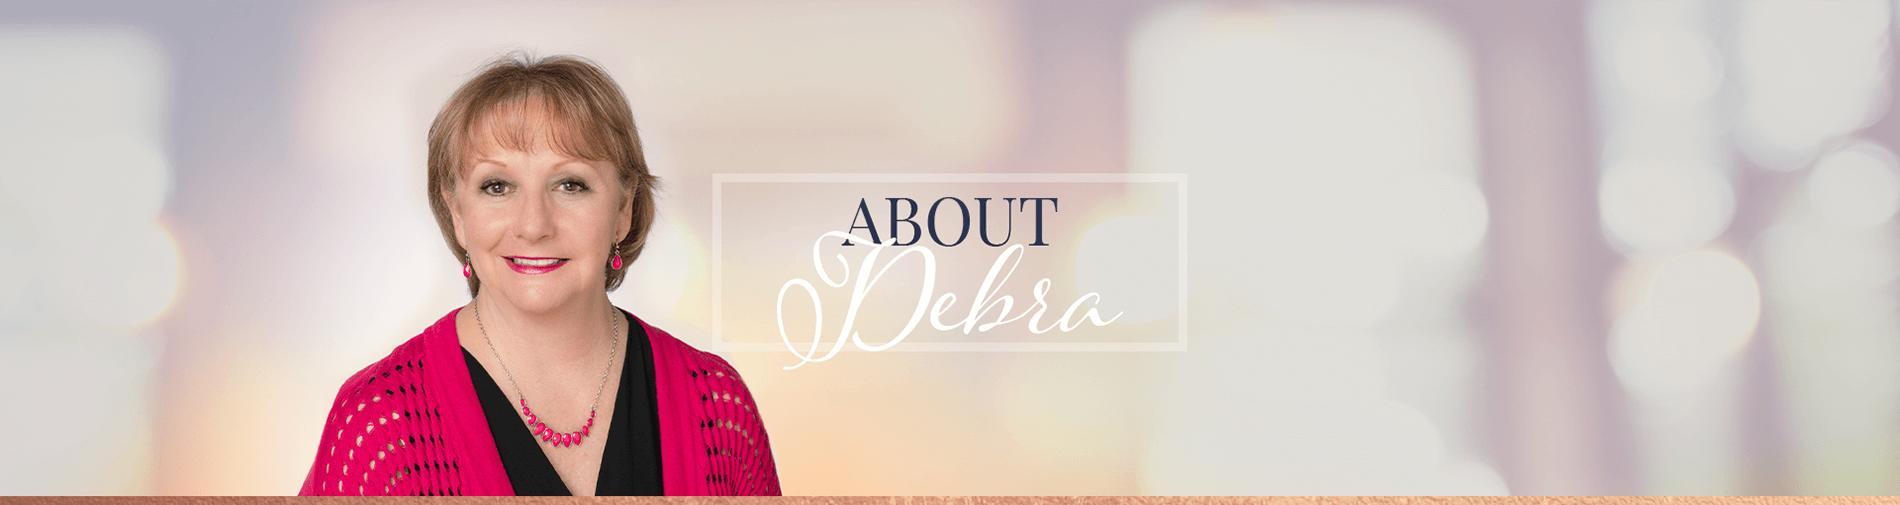 About Debra Irene